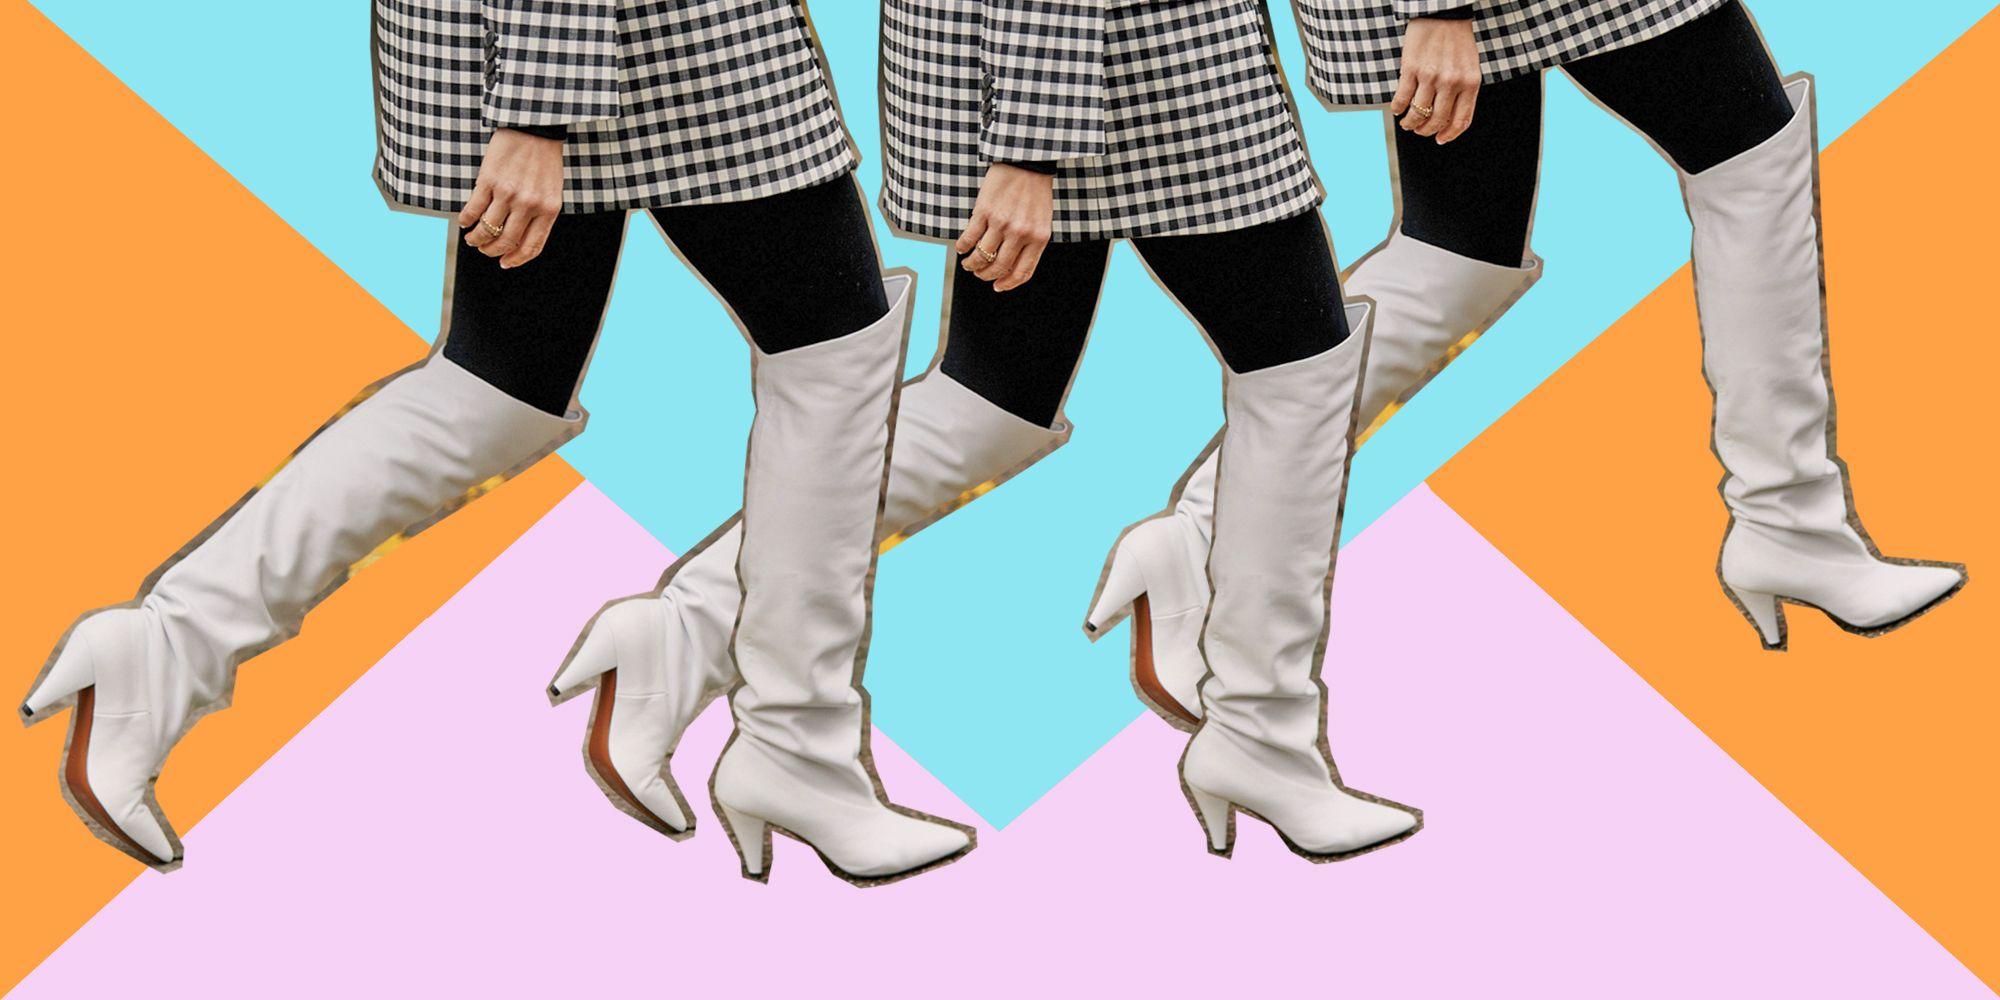 Stivali alti in pelle bianchi alla London Fashion Week 2019